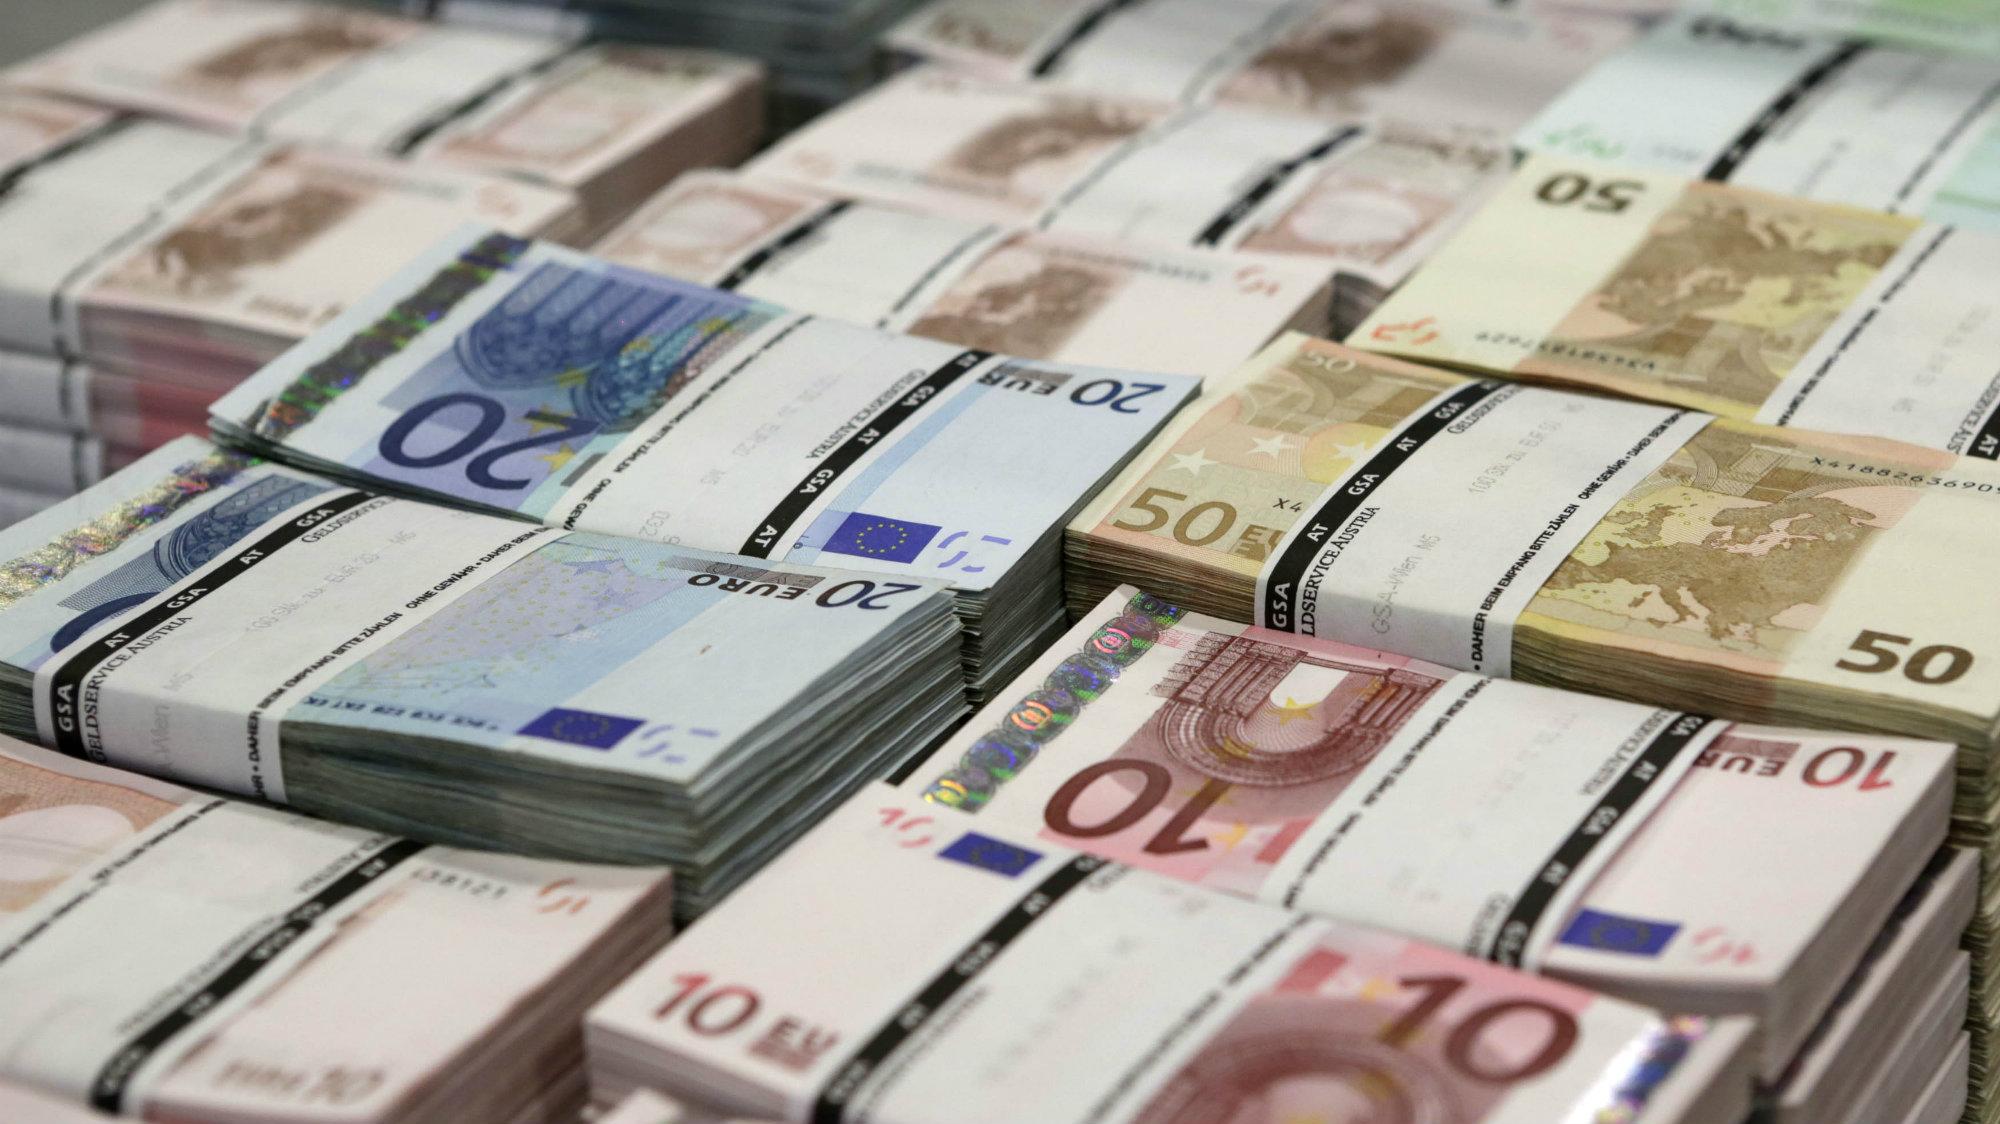 Piles of Euro banknotes